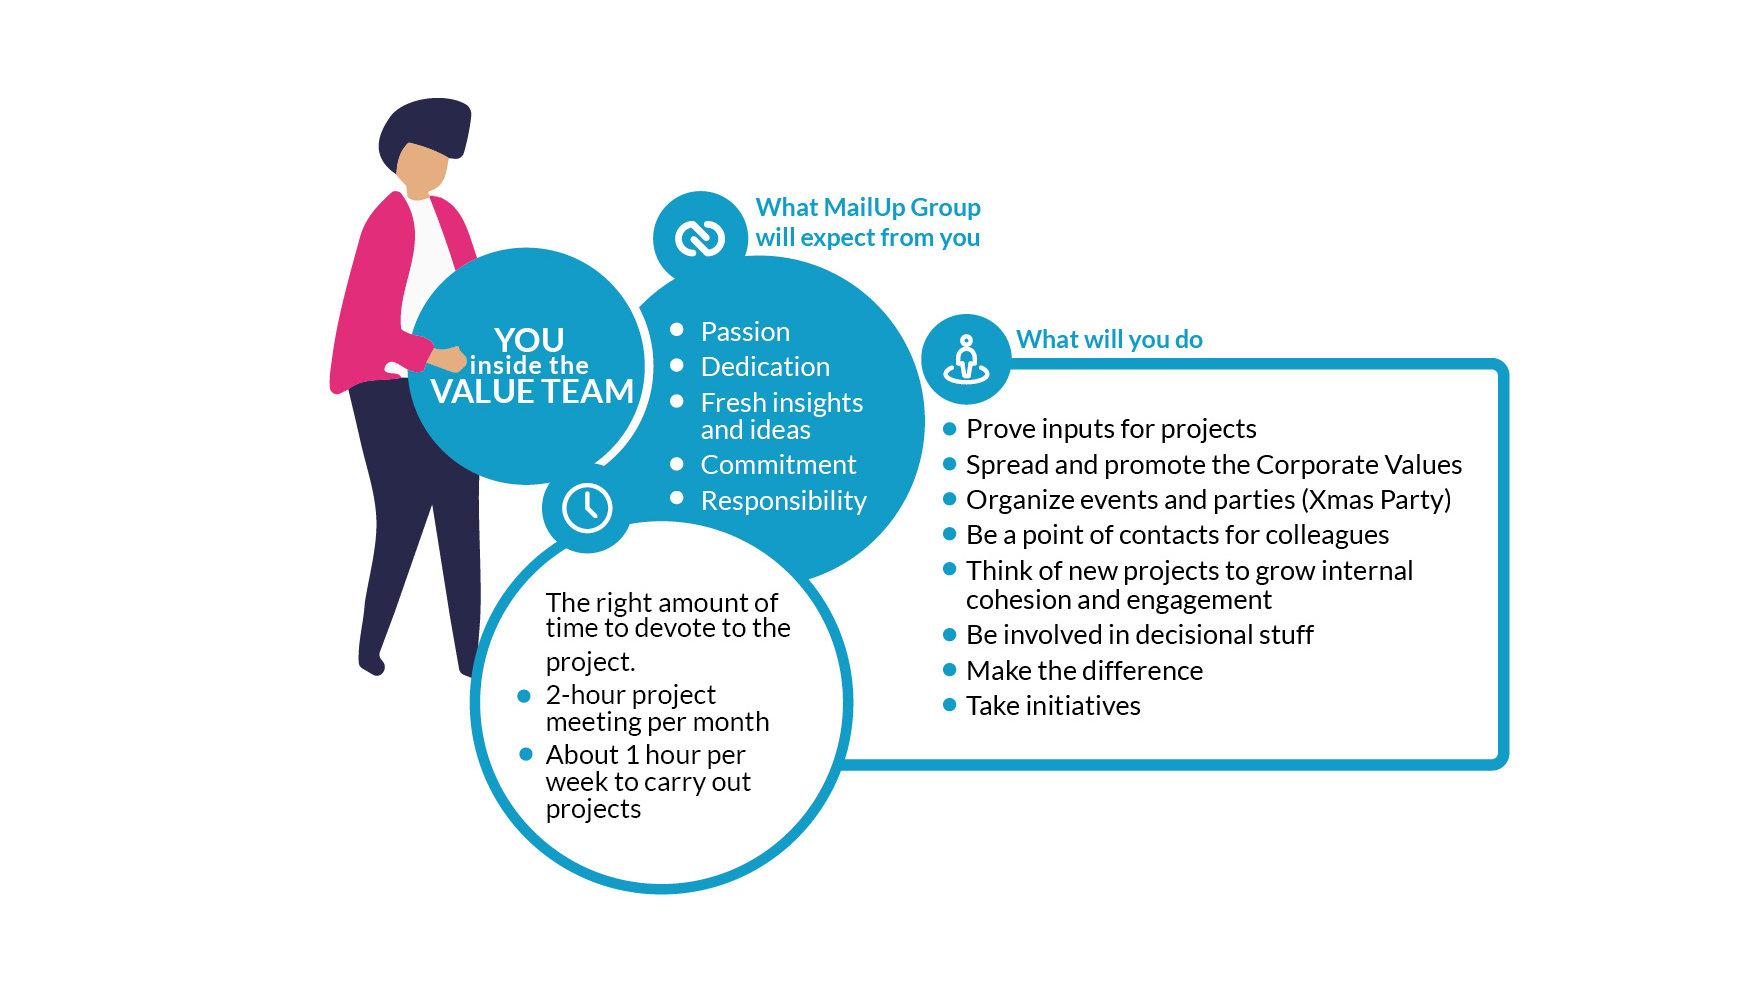 You inside the Value Team